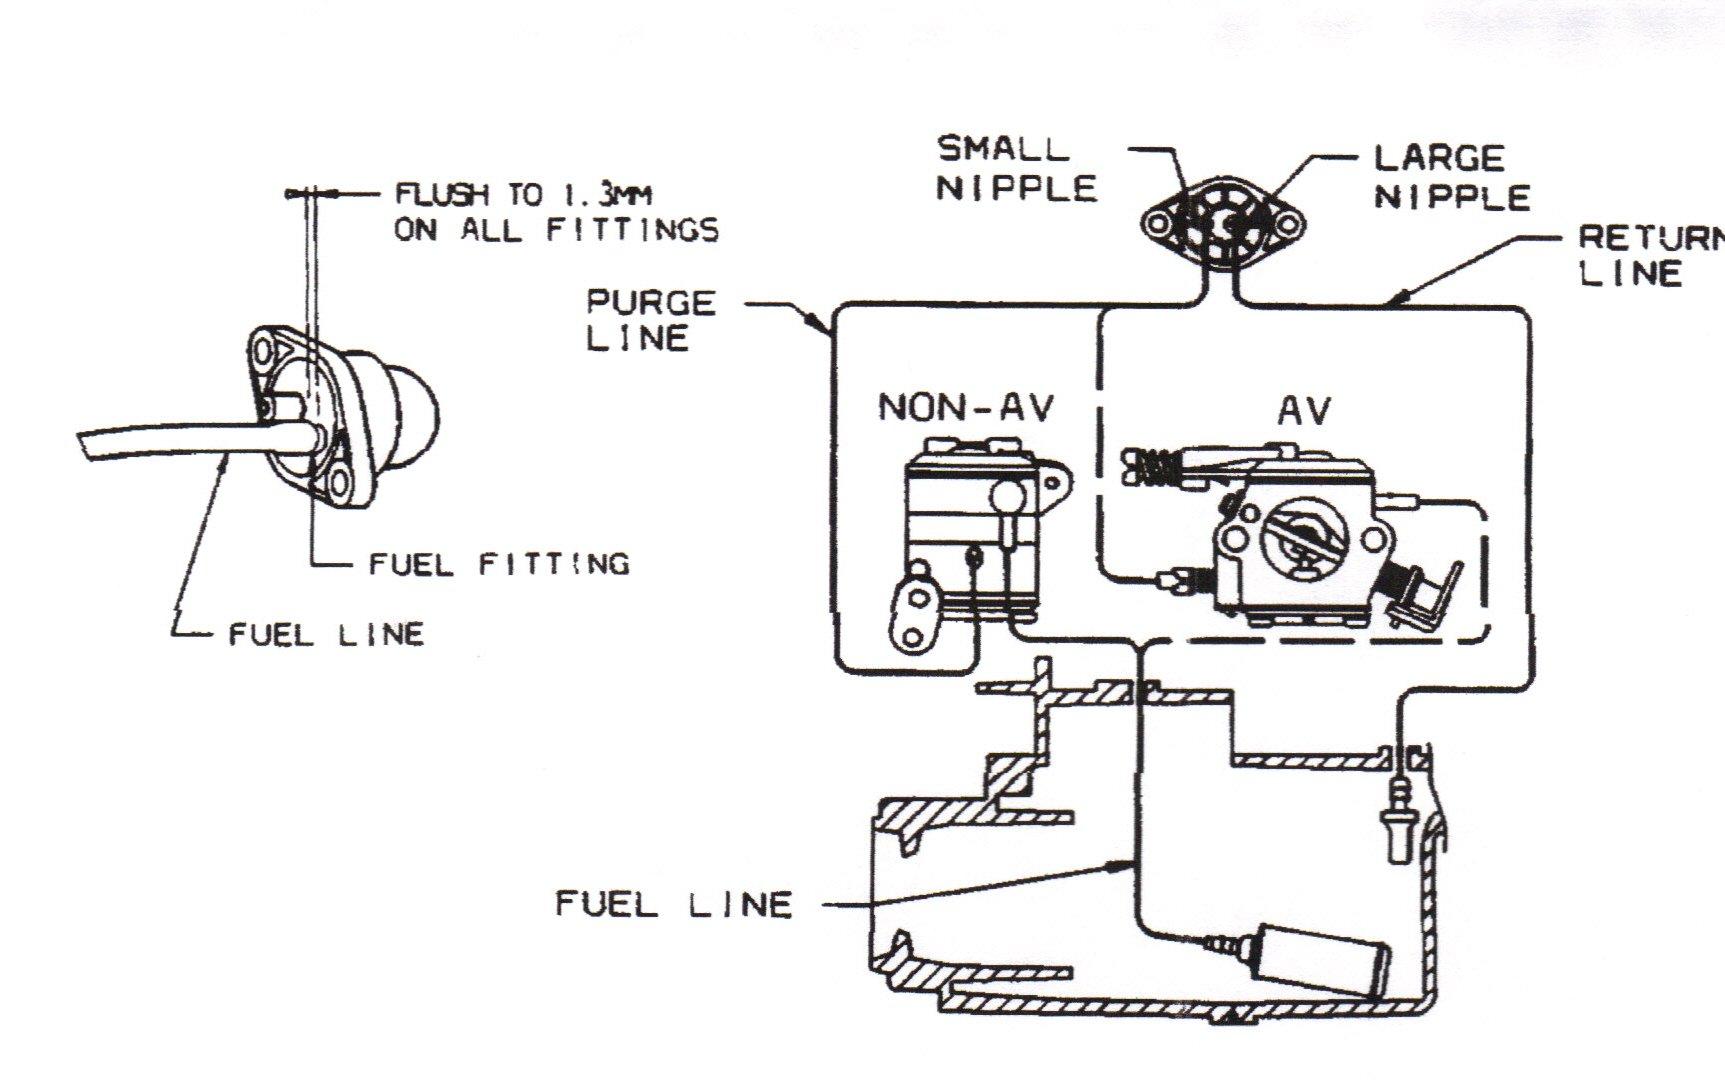 ryobi engine diagram mm 3135  fuel line also stihl chainsaw fuel line diagram on  fuel line also stihl chainsaw fuel line